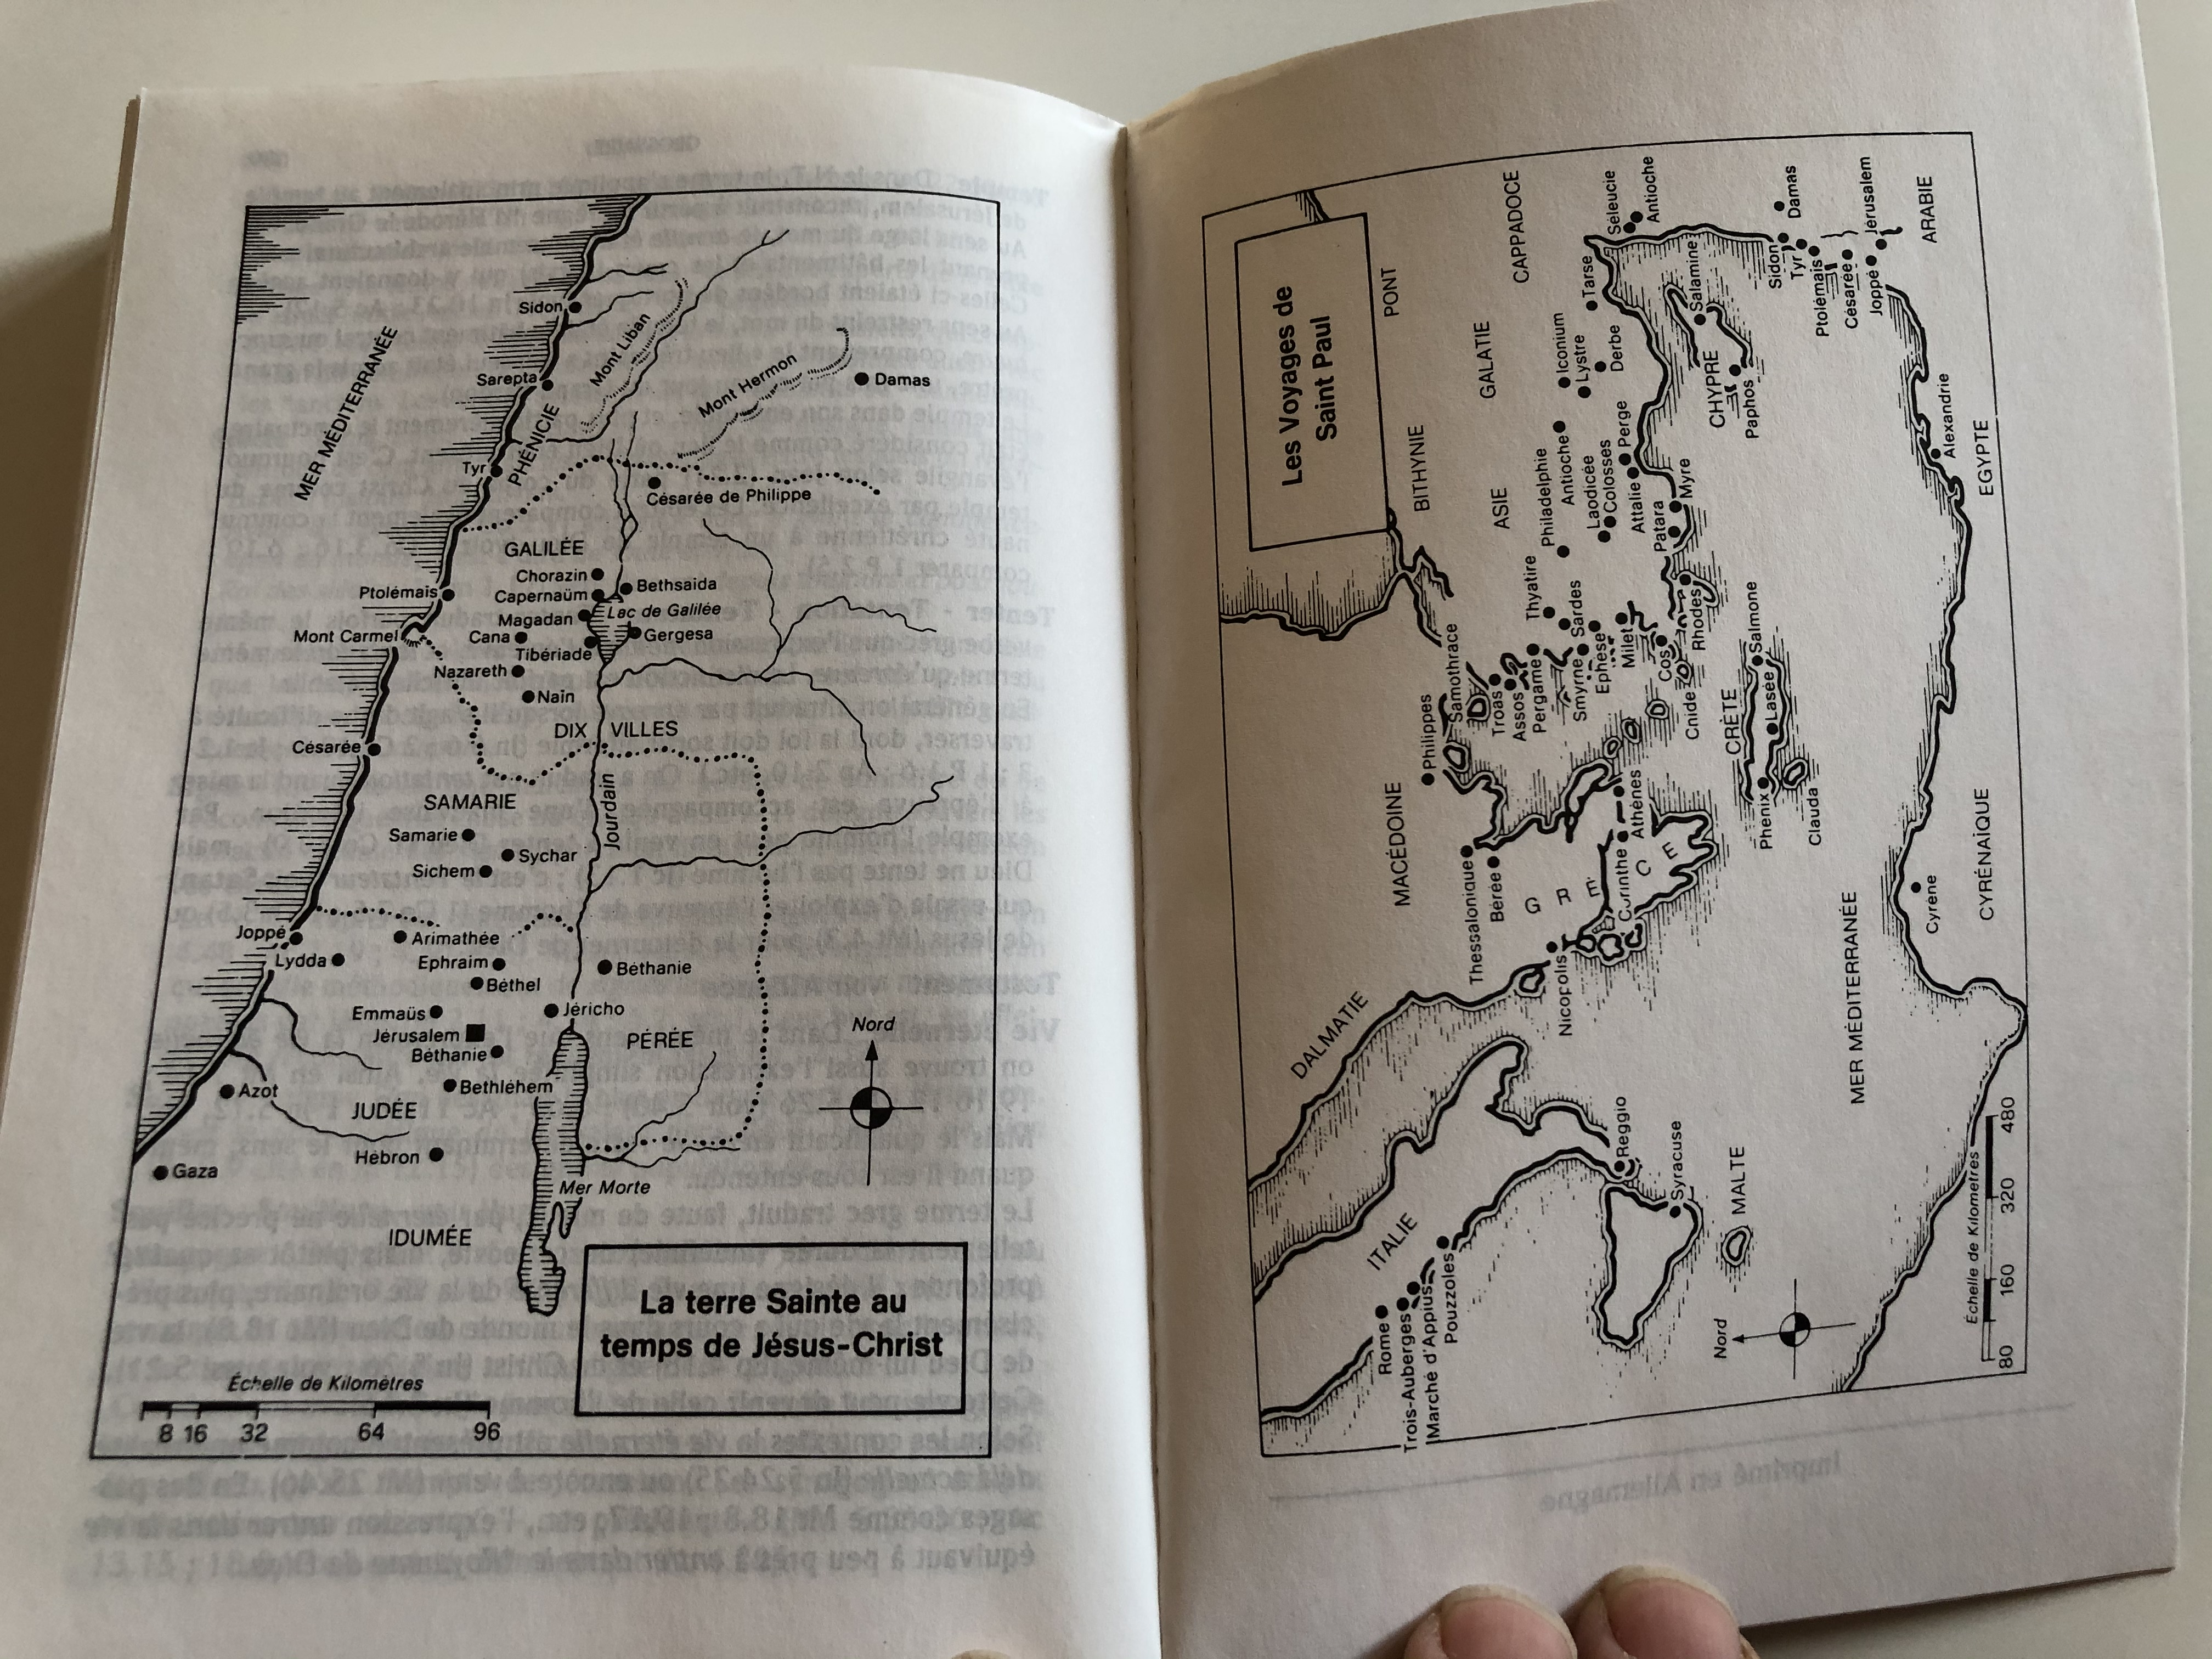 -nouveau-testament-french-language-tob-new-testament-paperback-13.jpg